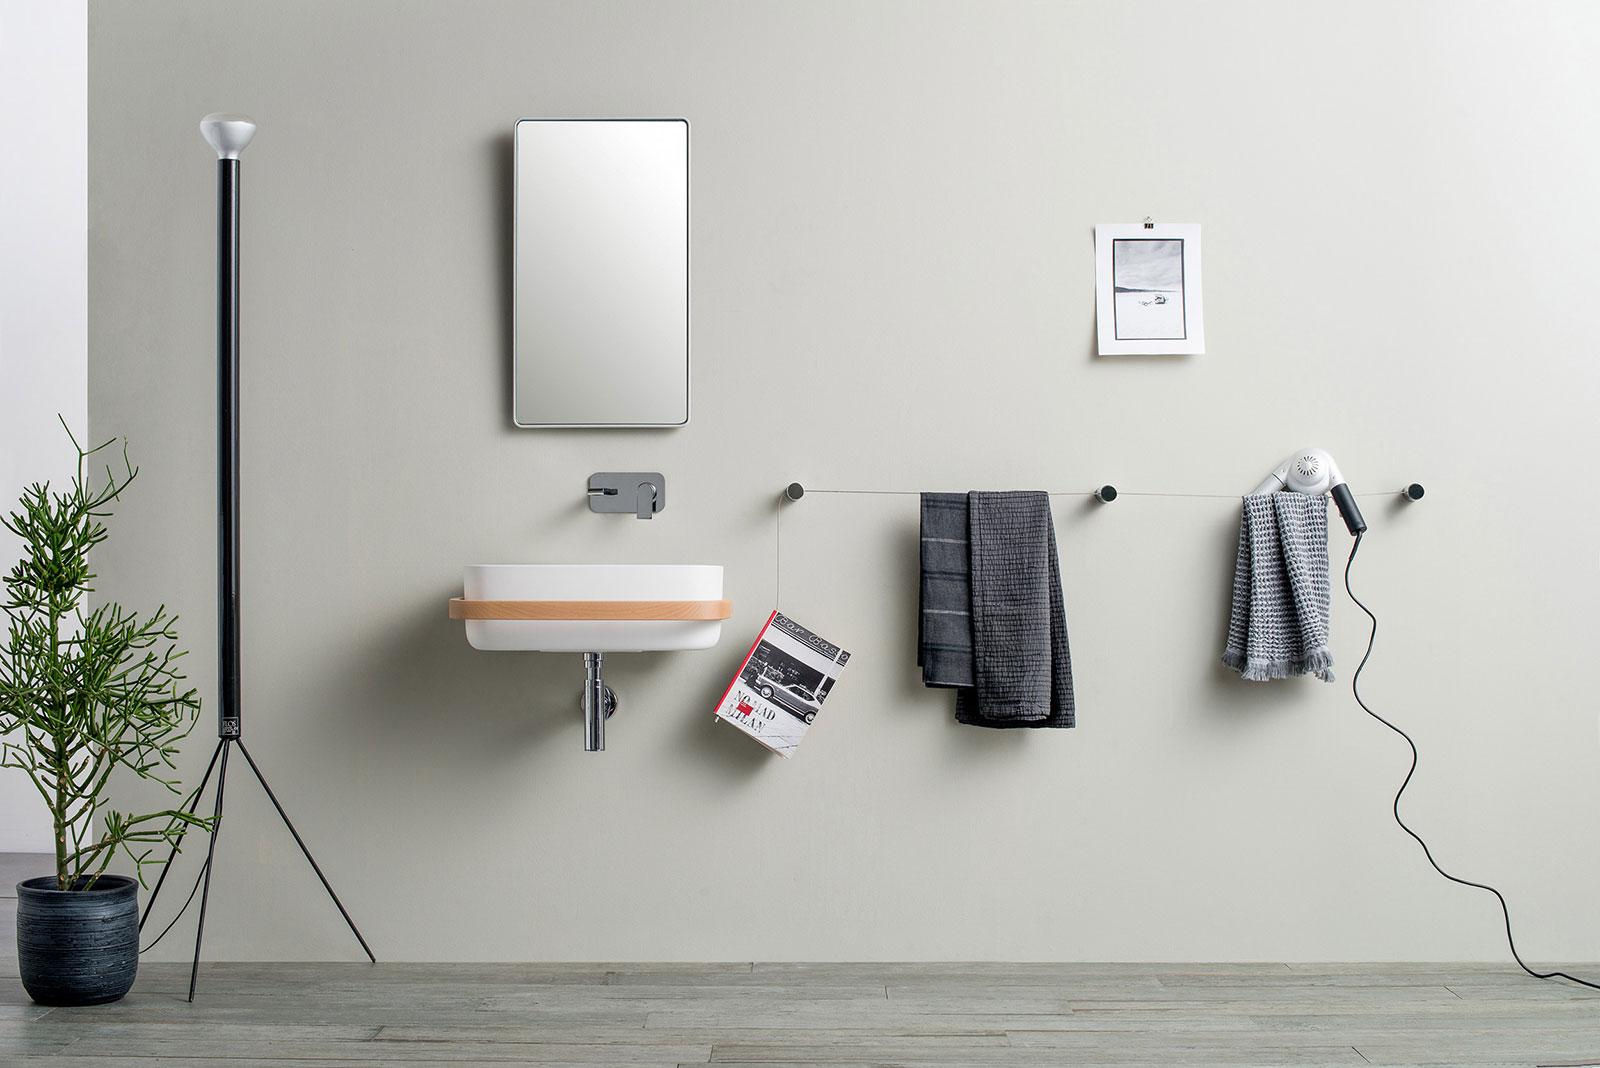 Portasciugamani Bagno Design : Dot everlifedesign